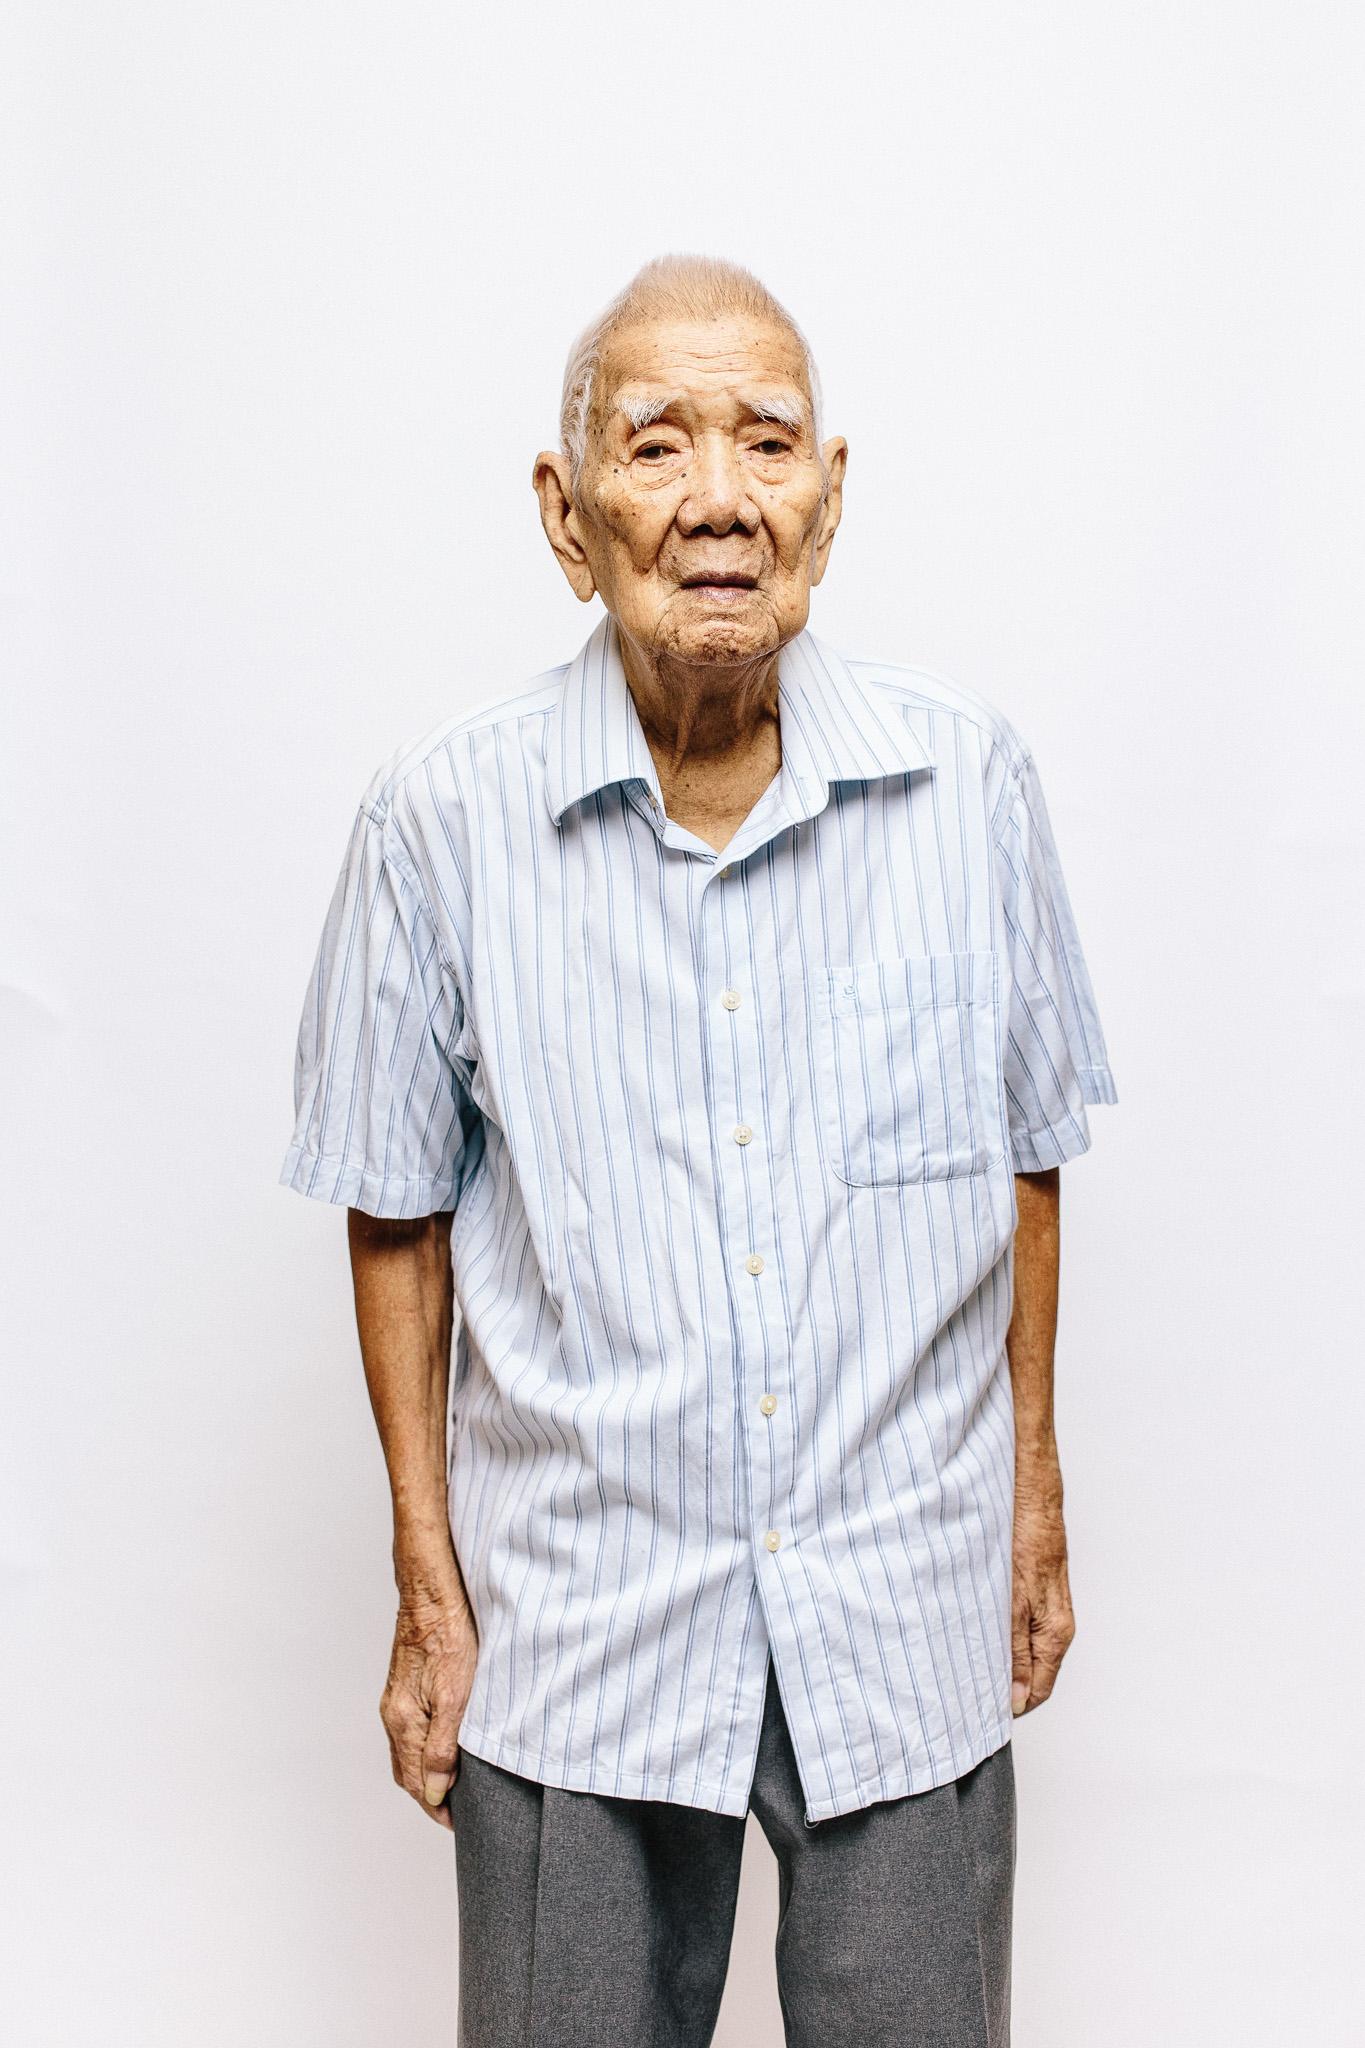 zainal-zainal-studio-centenarians-care-duke-nus-singapore-photographer-08.jpg